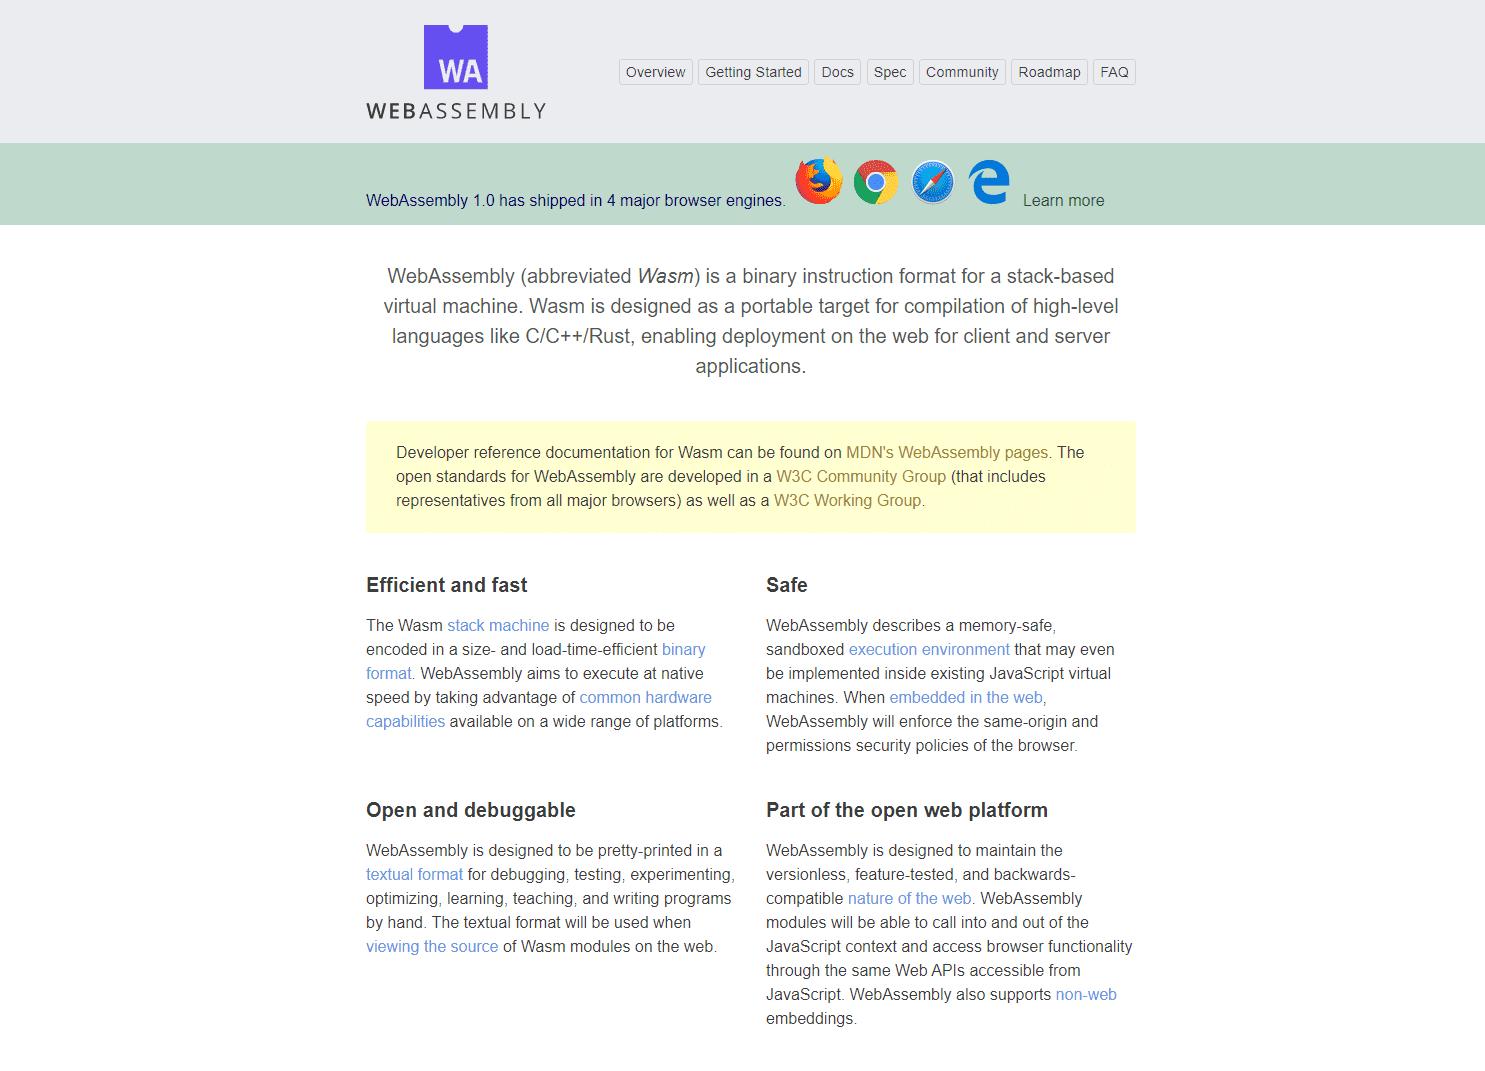 WebAssemblyはWebブラウザで実行できるバイナリフォーマット